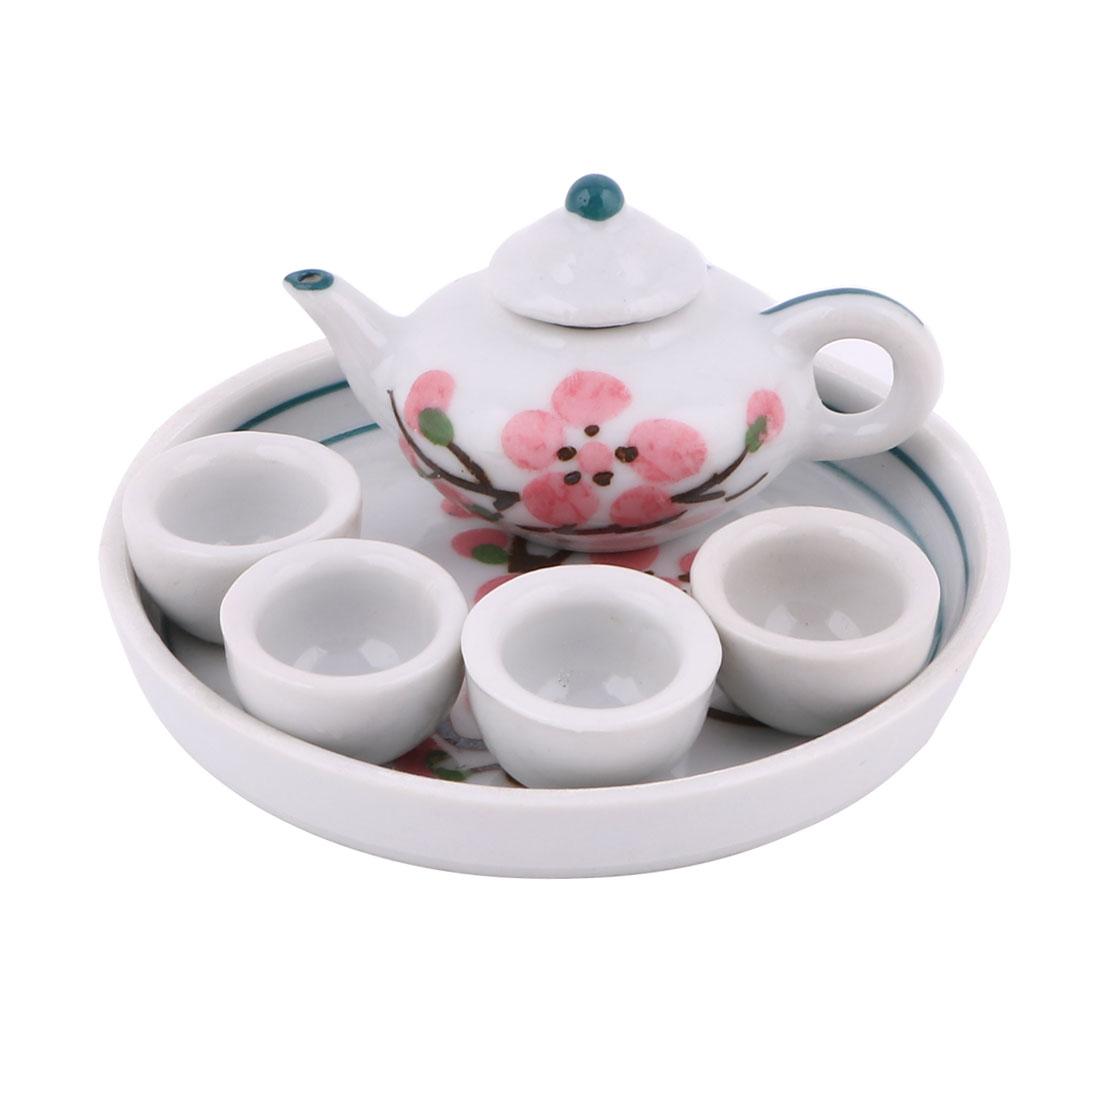 Ceramic Plum Blossom Printed Mini Plate Teapot Cup Tea Set Pink White